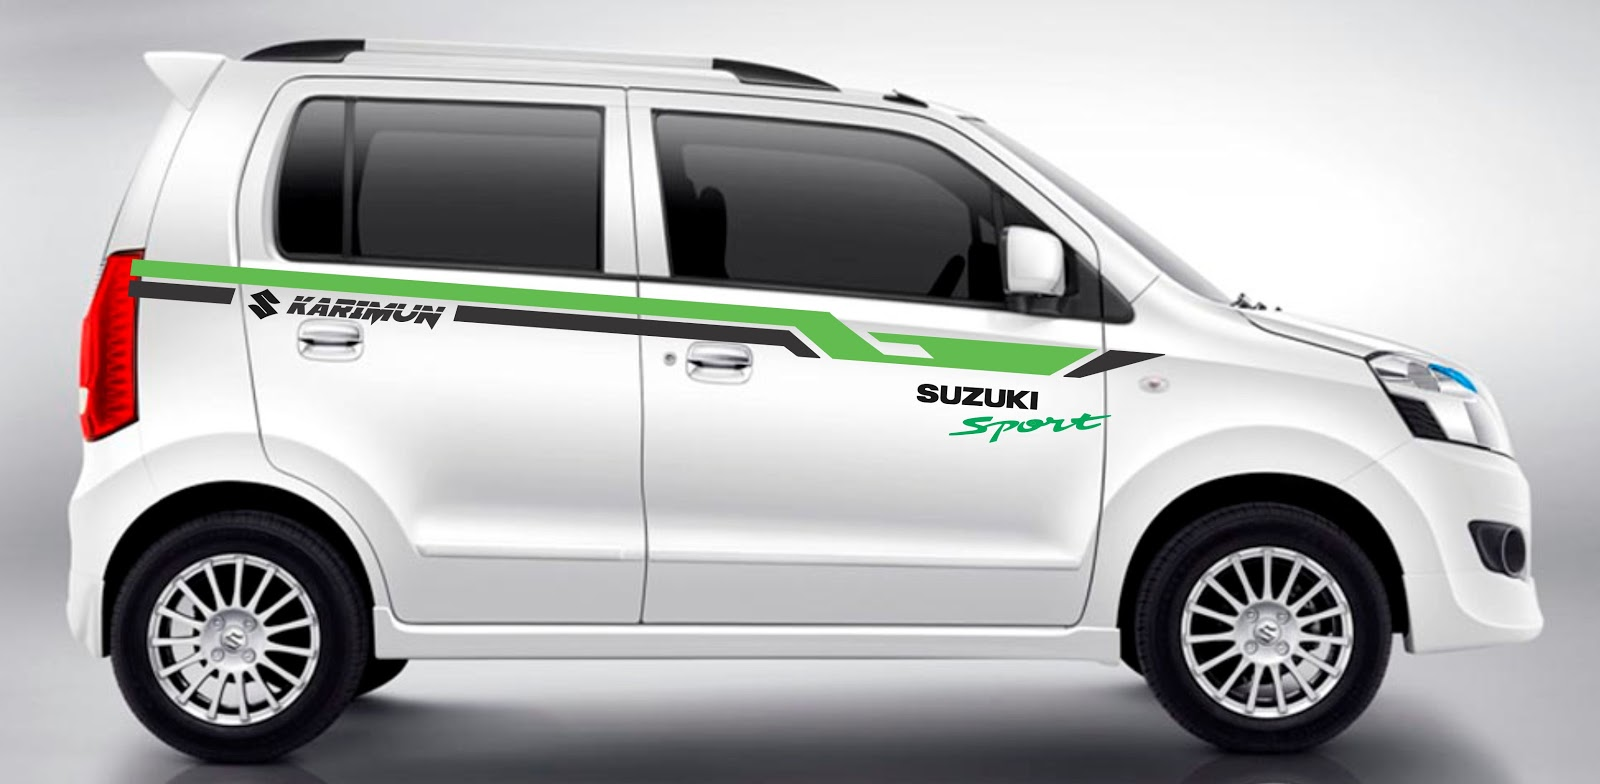 Modifikasi harga cutting sticker mobil karimun 2019 retromodif